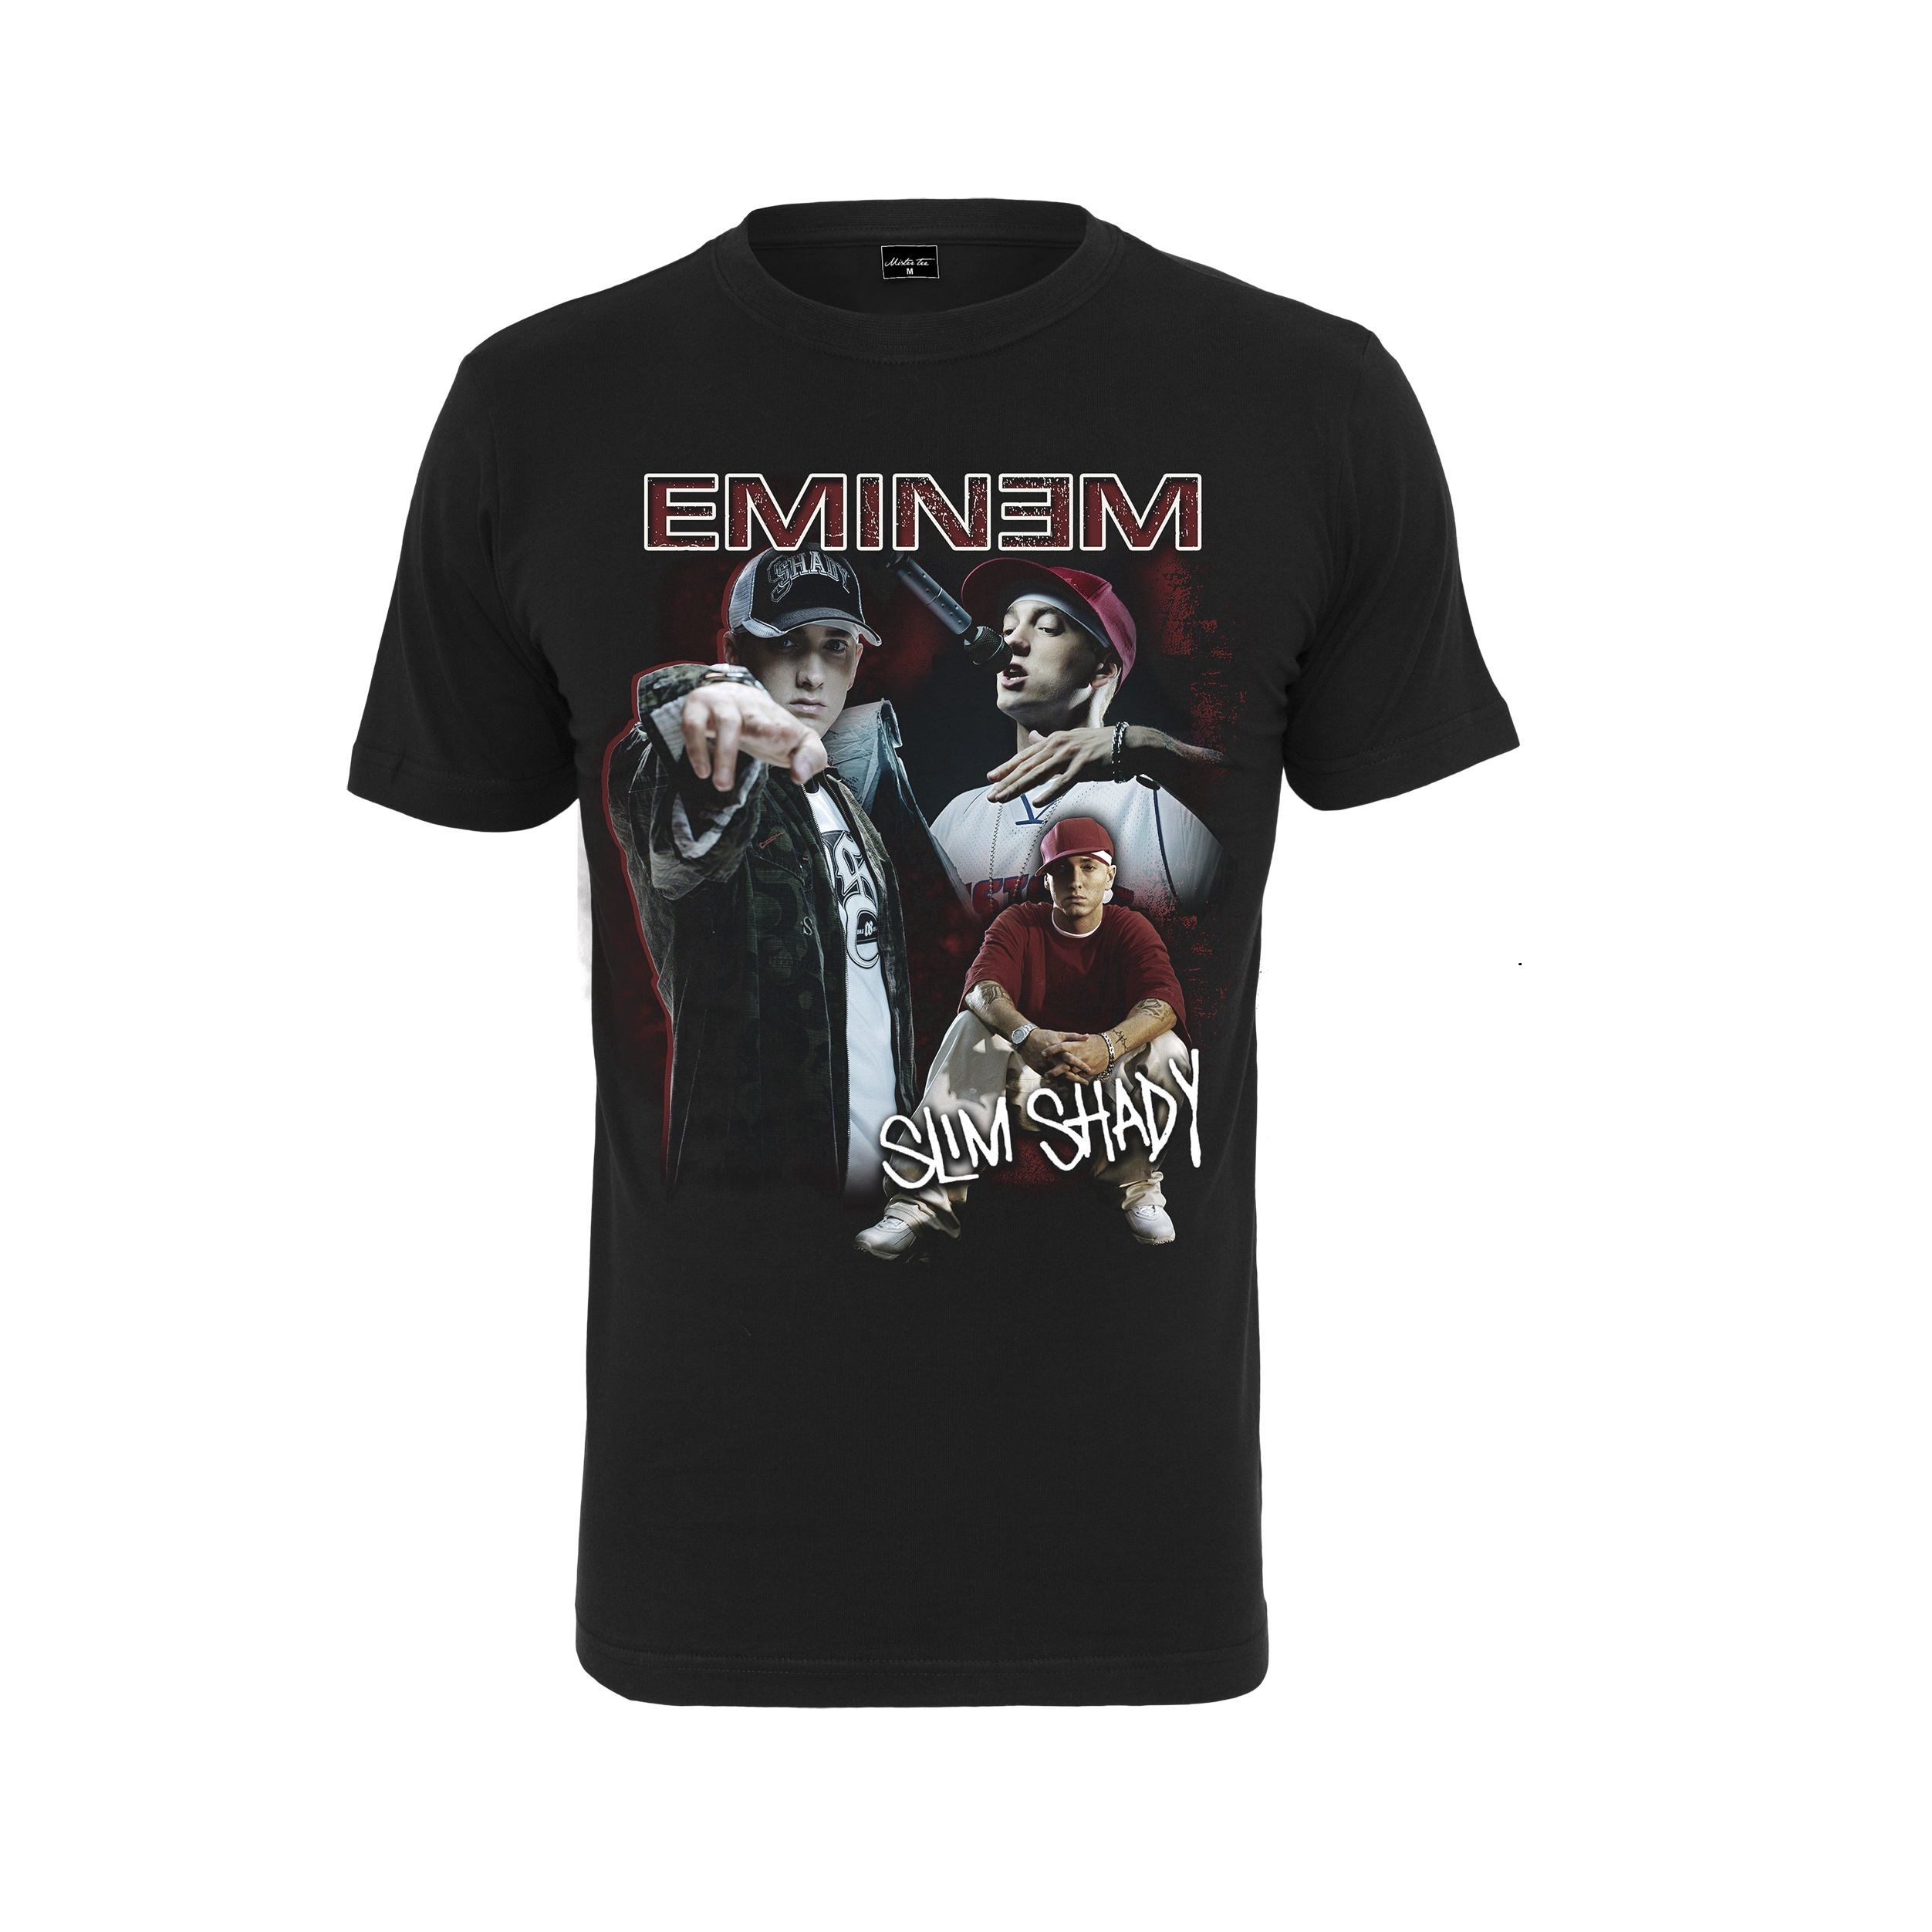 Eminem - Tričko Slim Shady Tee - Muž, Čierna, L